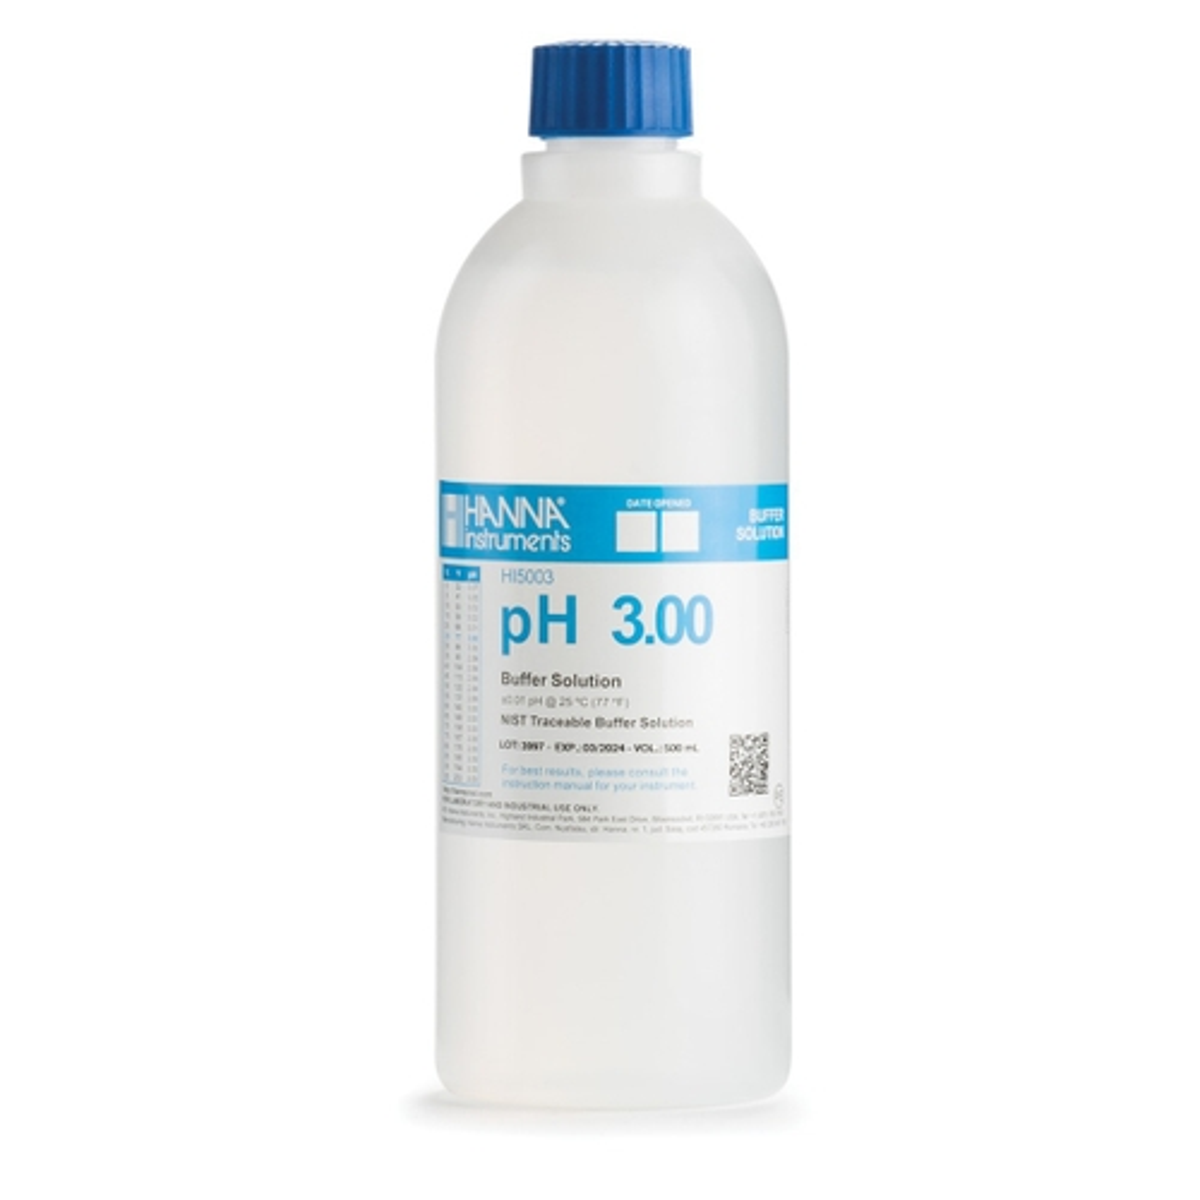 HI5003 pH 3.00 Technical Calibration Buffer (500 mL)